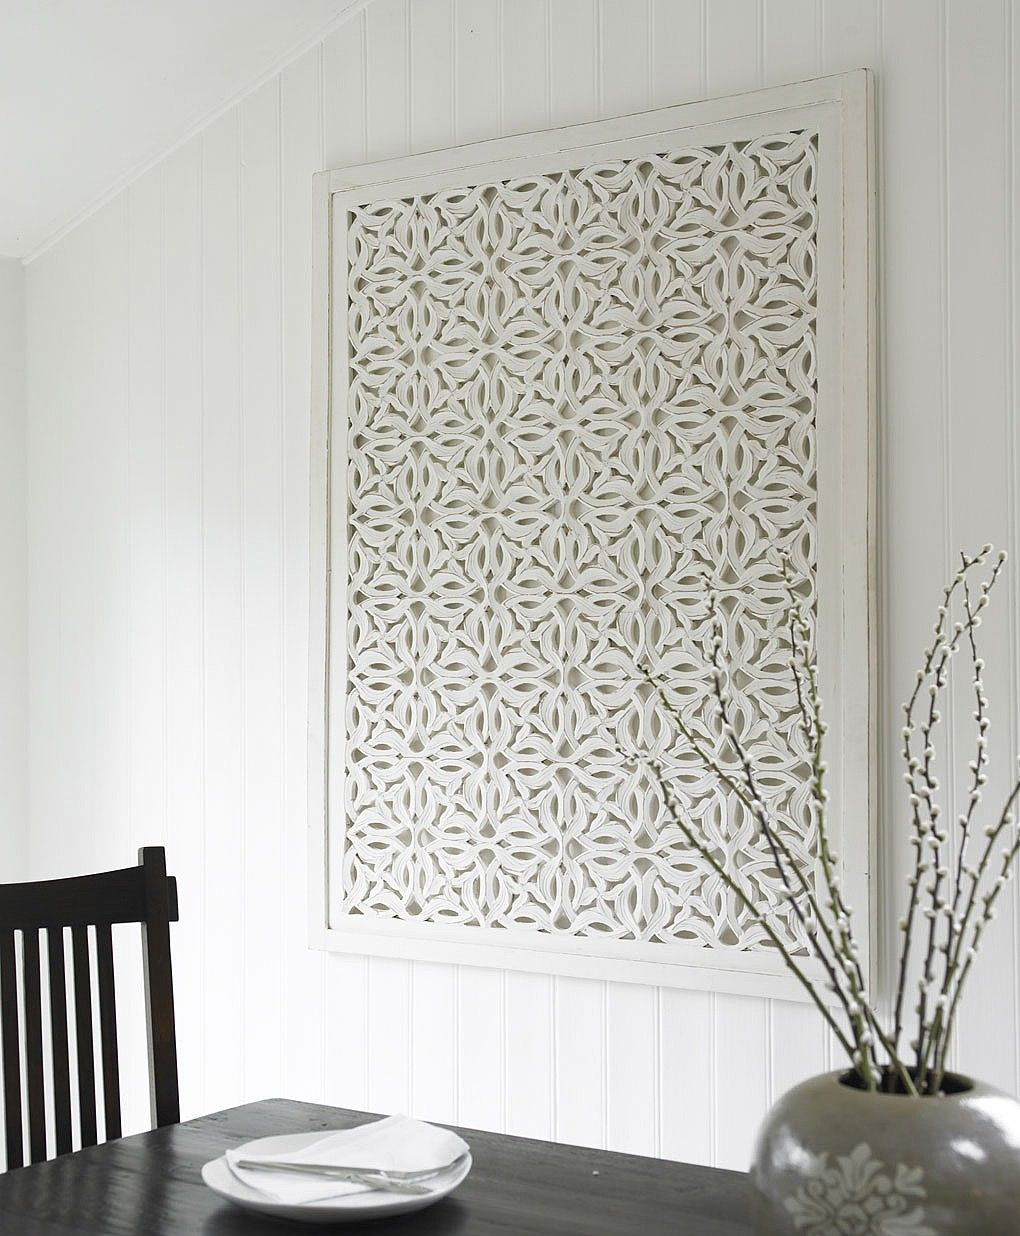 decorative wood wall panels Декоративный бетон